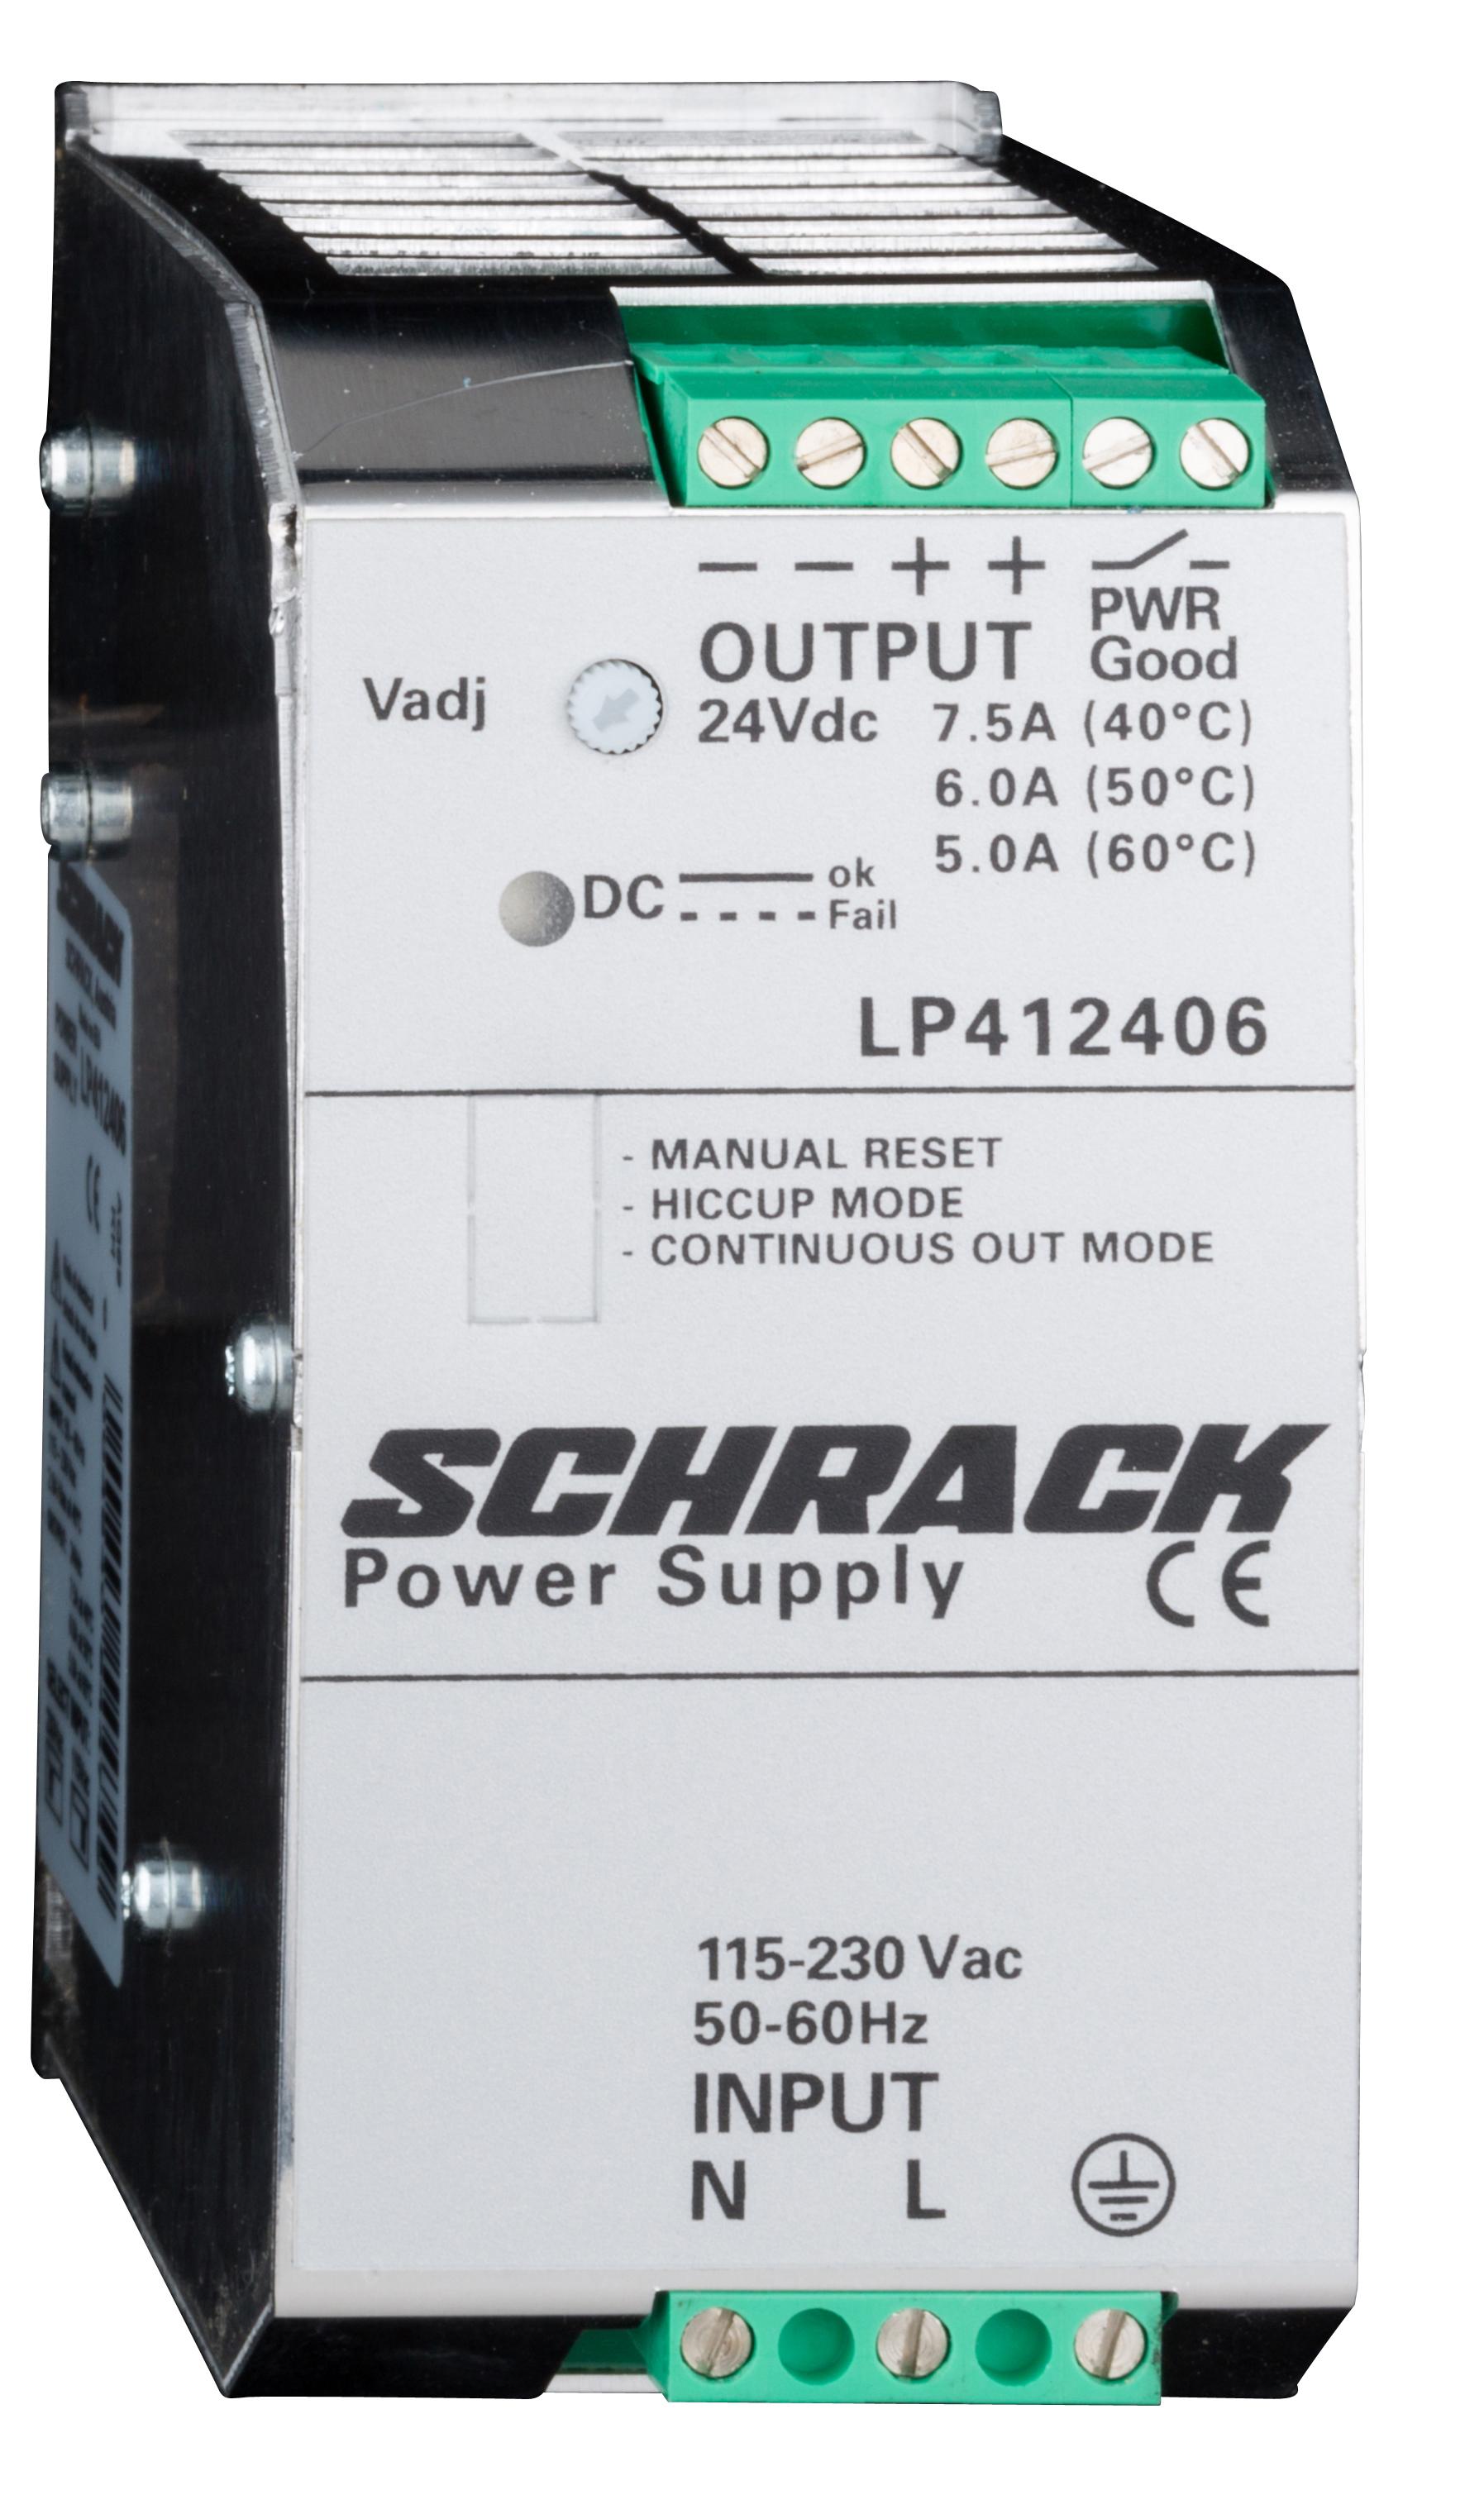 1 Stk Einphasiges Netzgerät getaktet, 230VAC/24VDC, 6A bei 50°C LP412406--